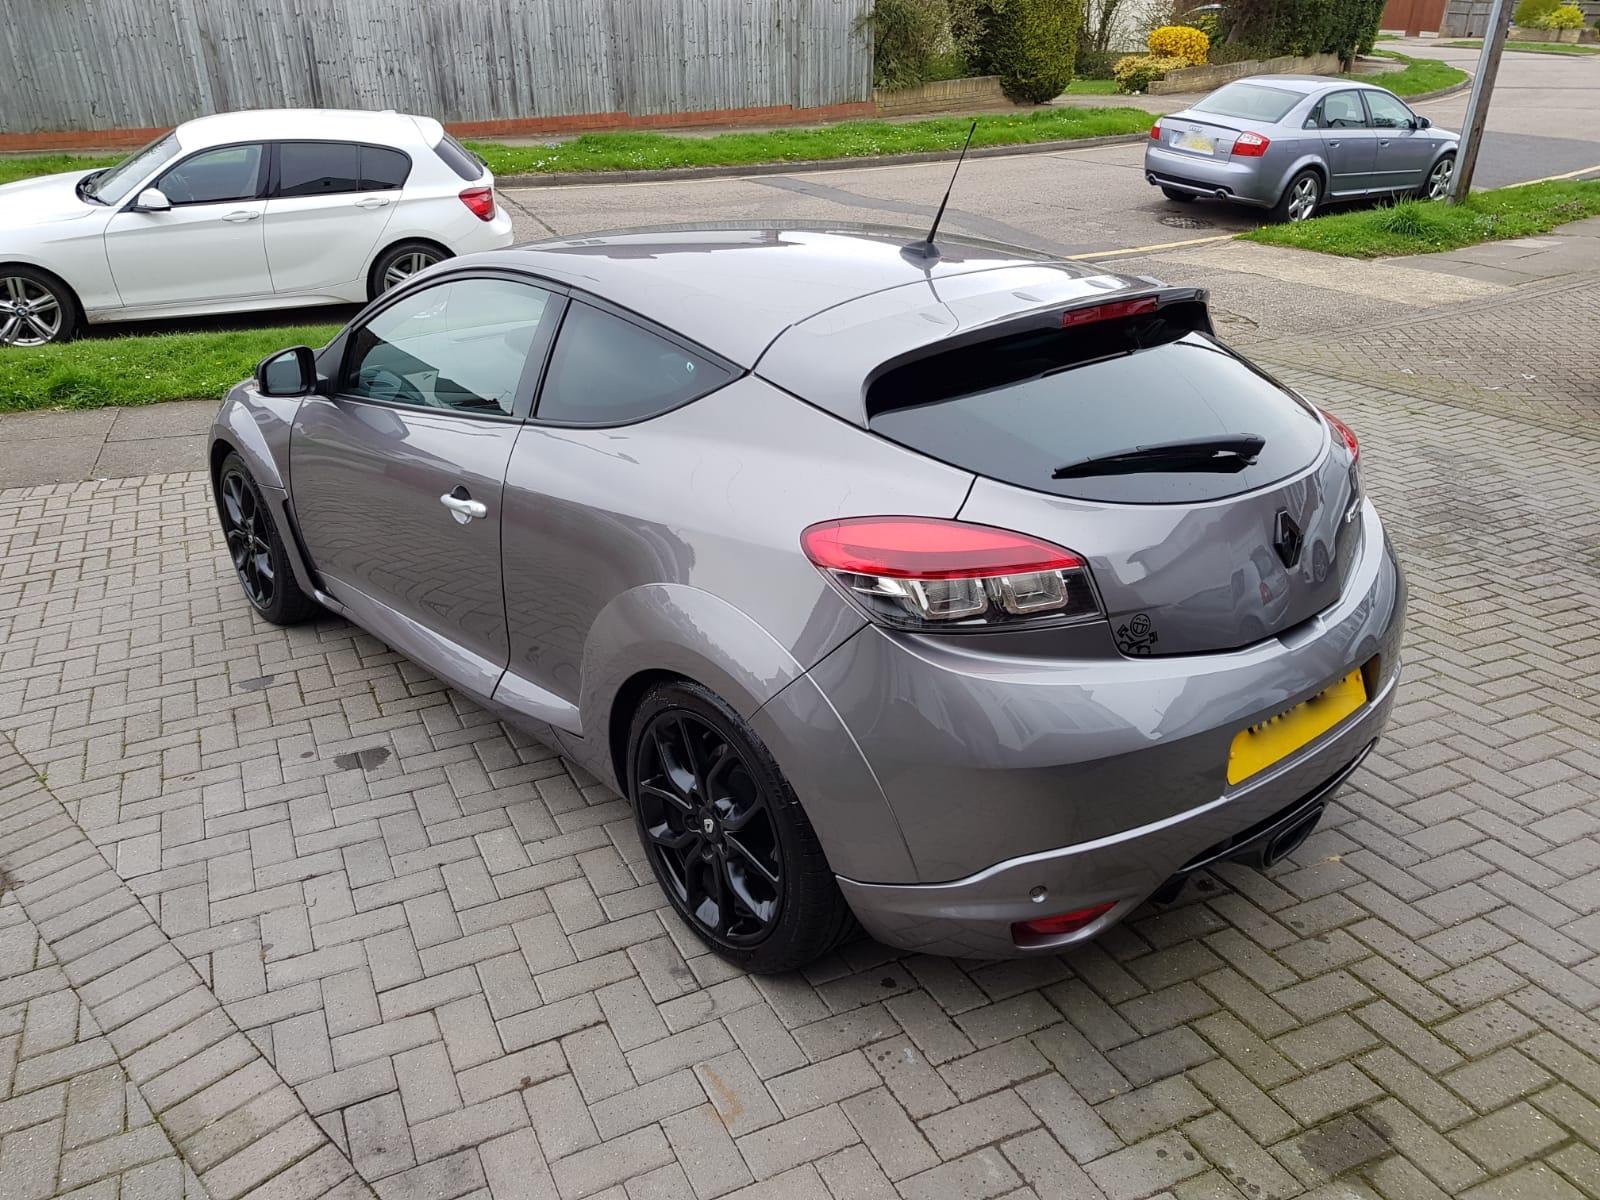 Renaultsport Megane Rs 250 Daily Cliosport Net